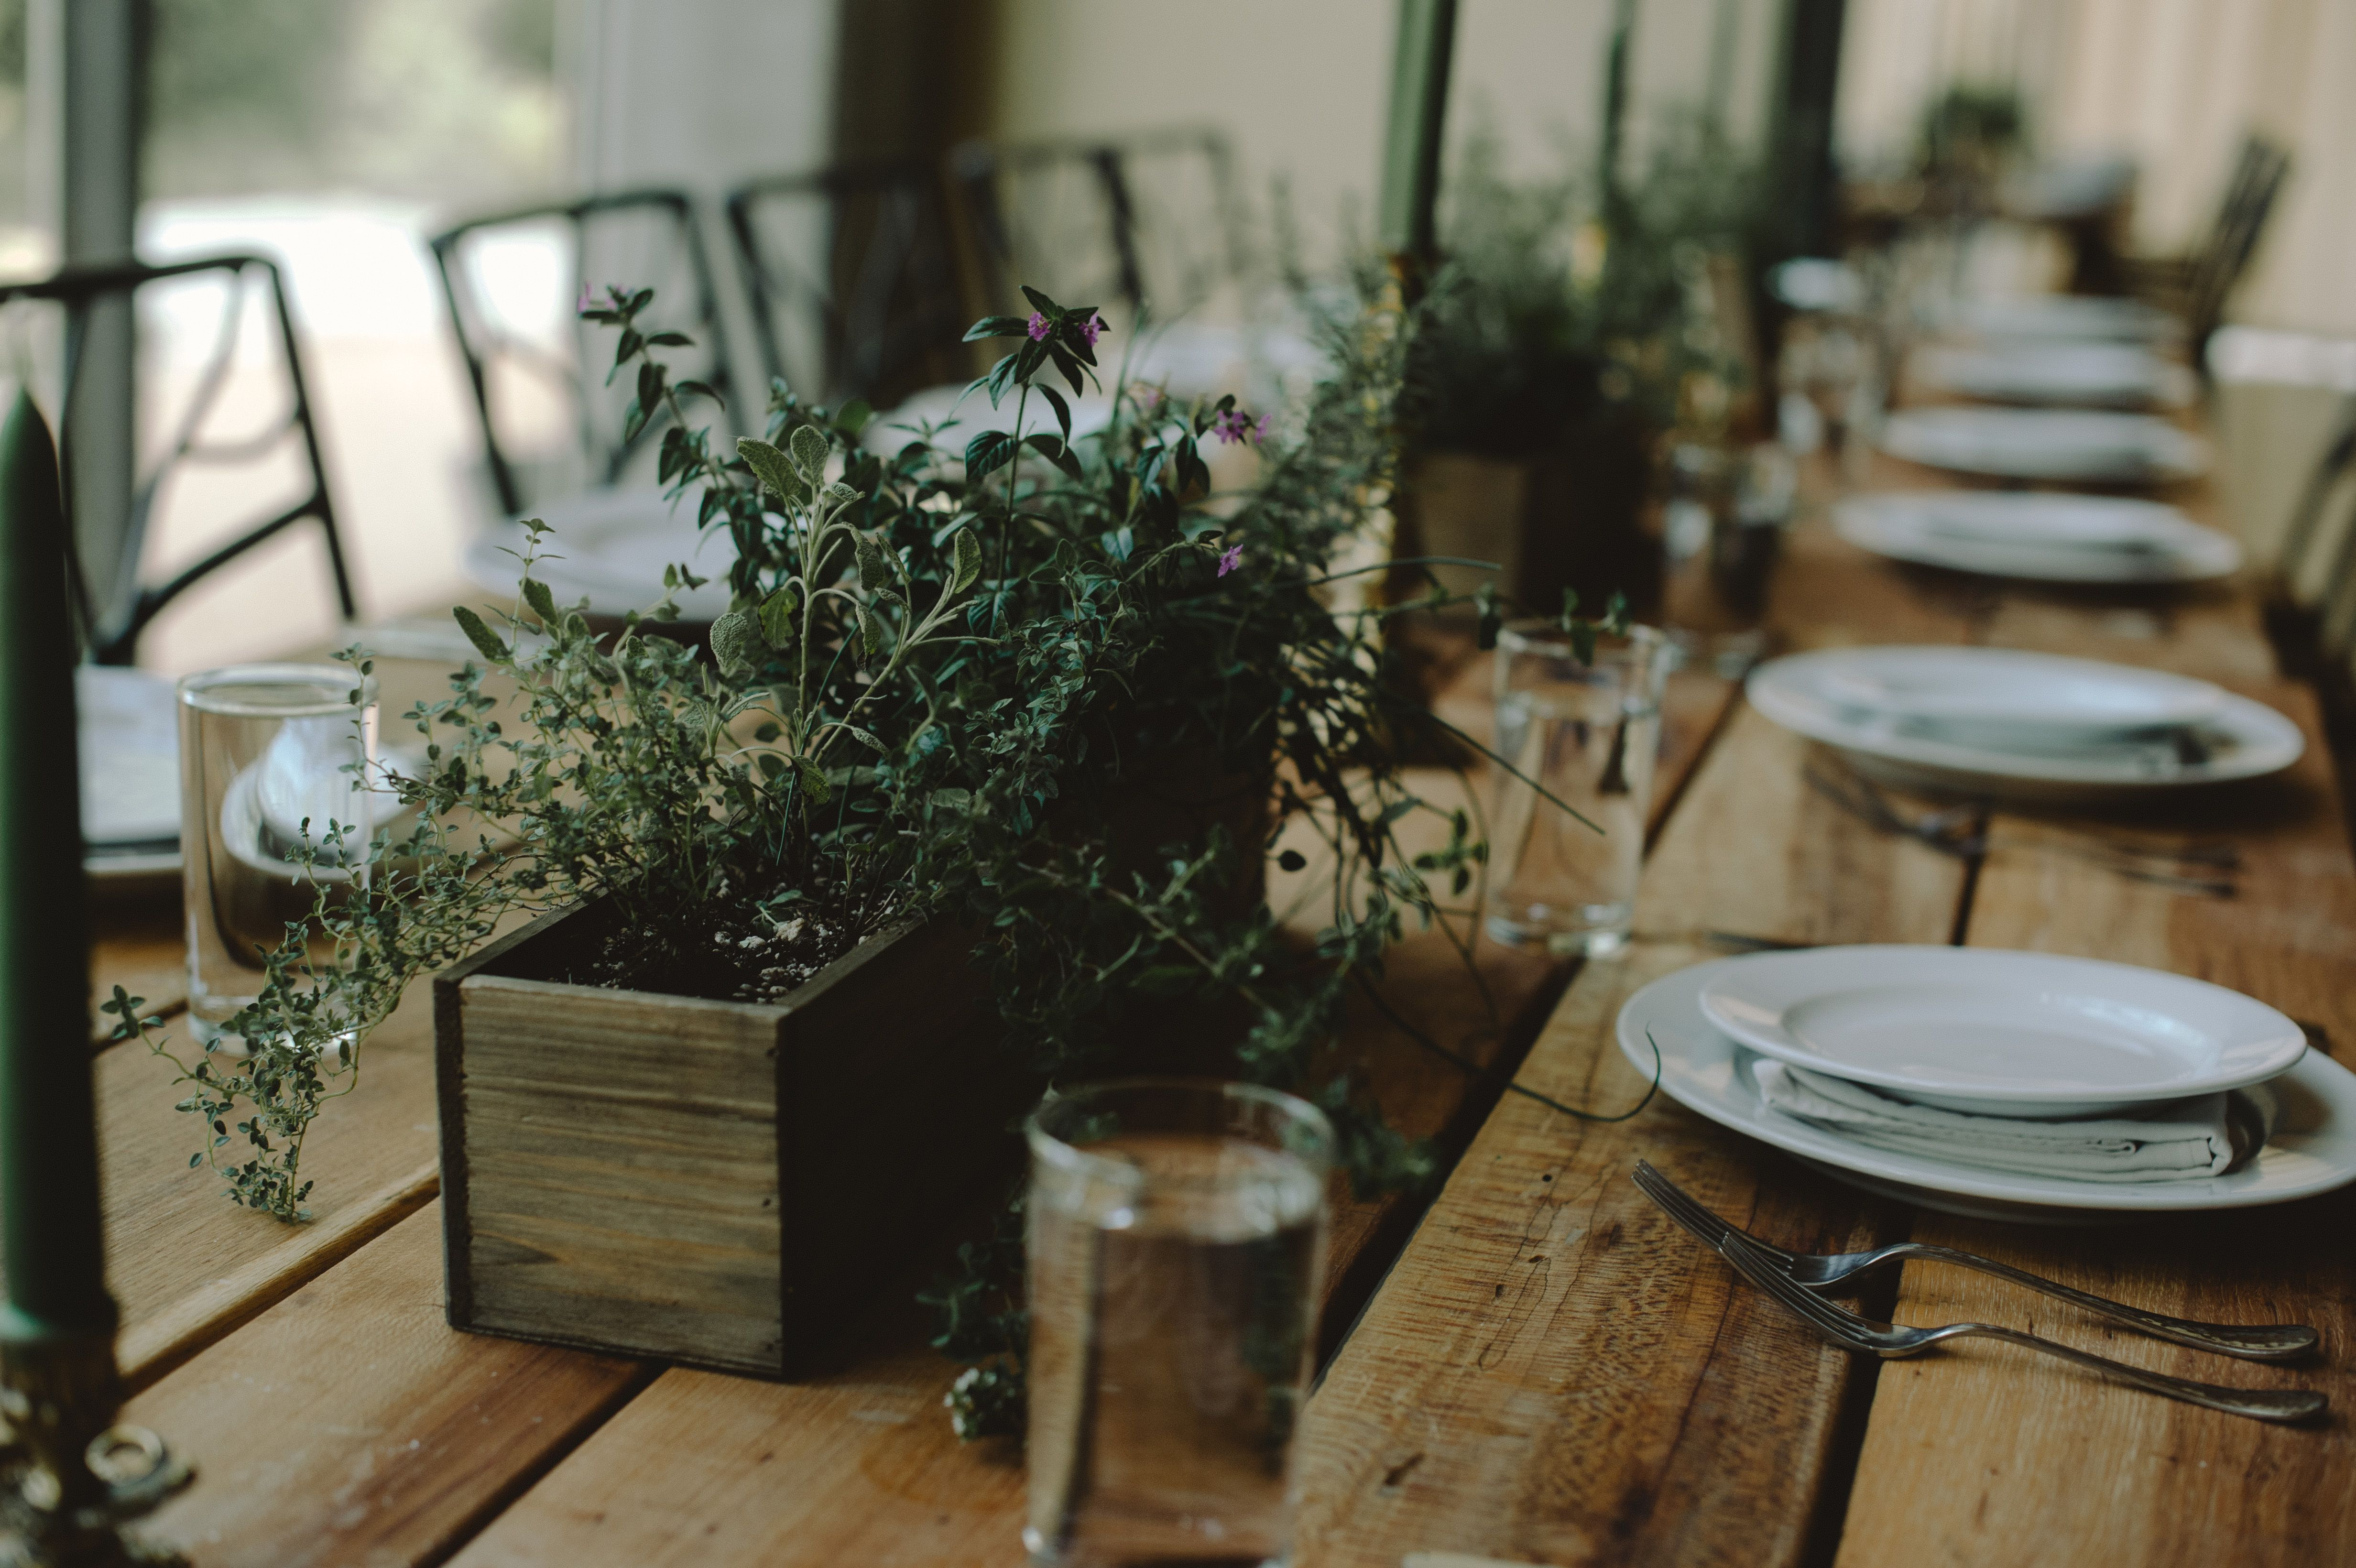 Best greenery wedding centerpieces green centerpieces for wedding